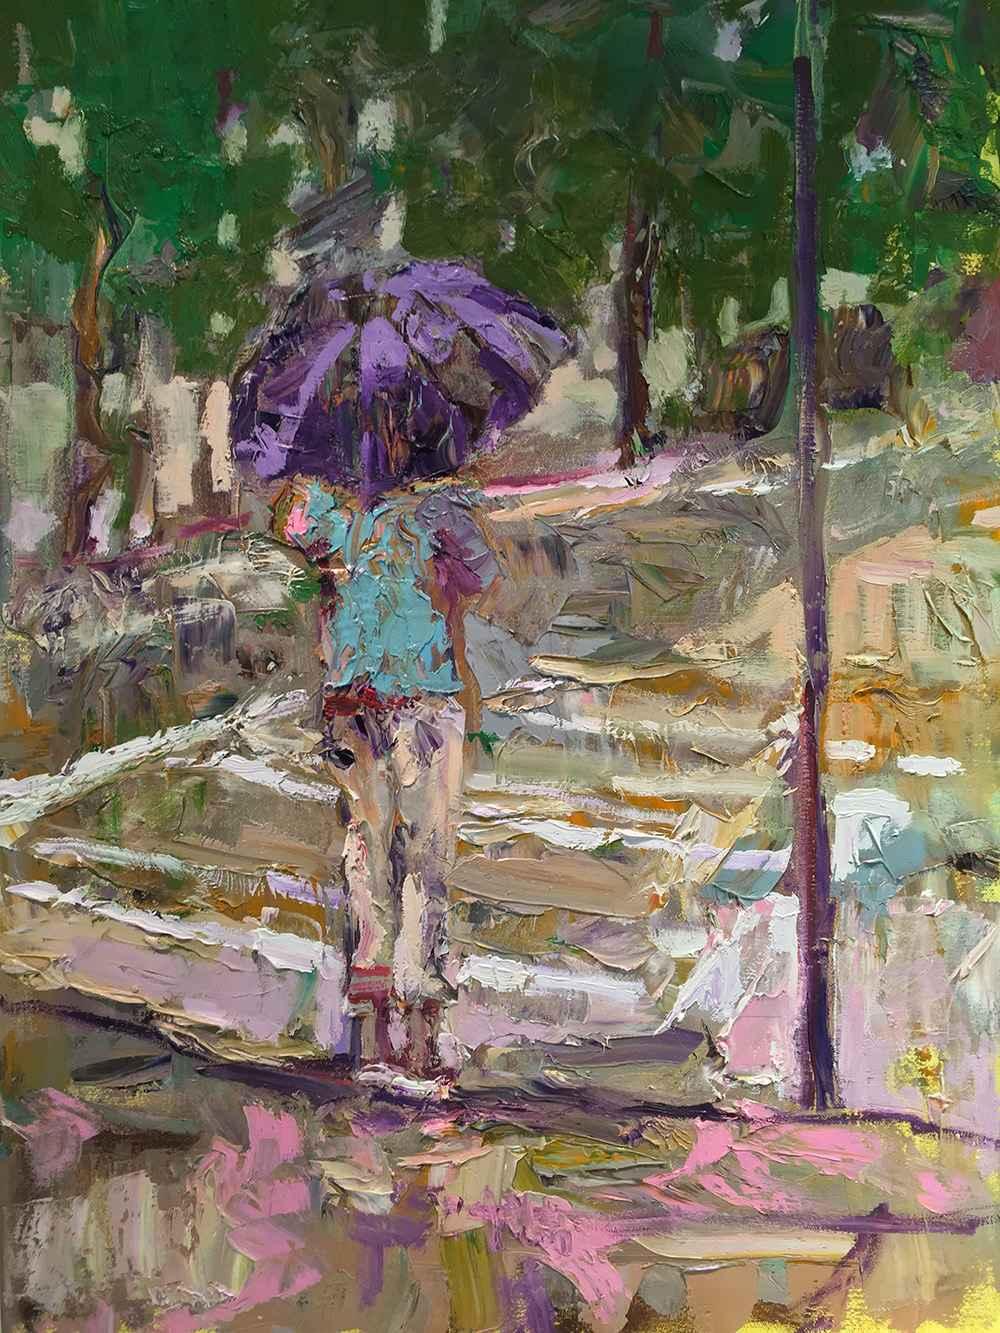 Thick Rain by  Traeger di Pietro - Masterpiece Online